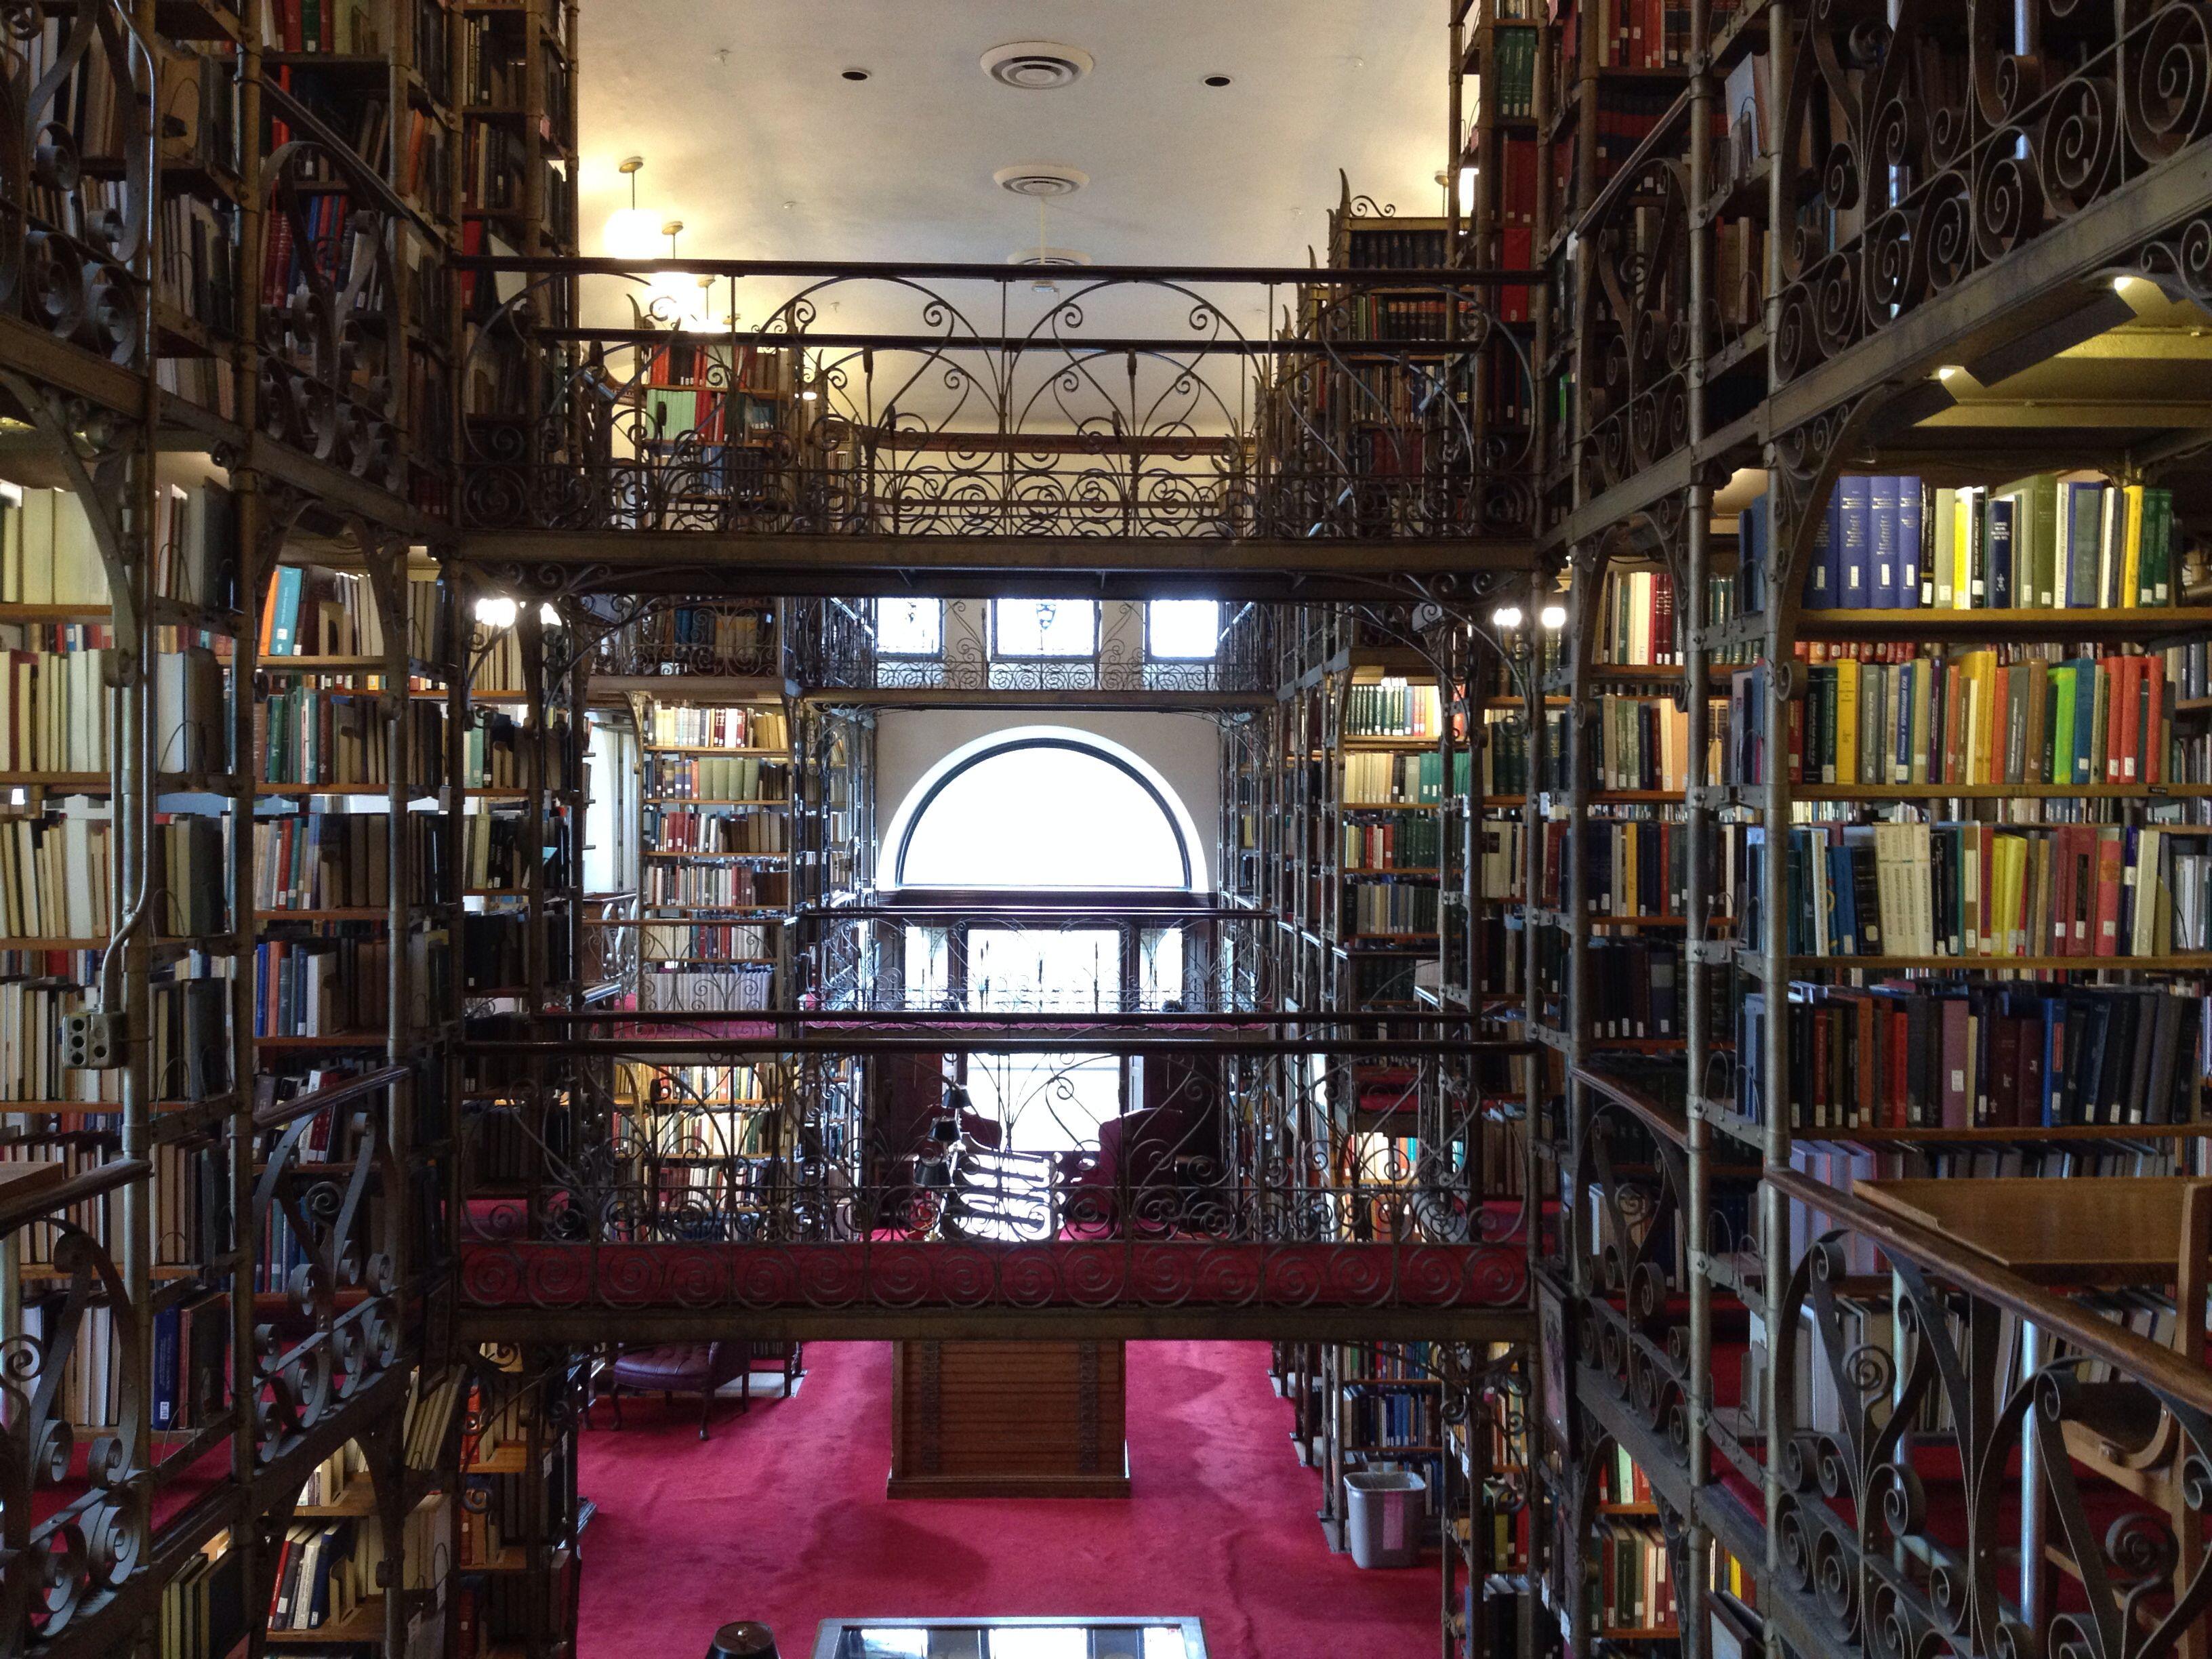 Cornell university porn library